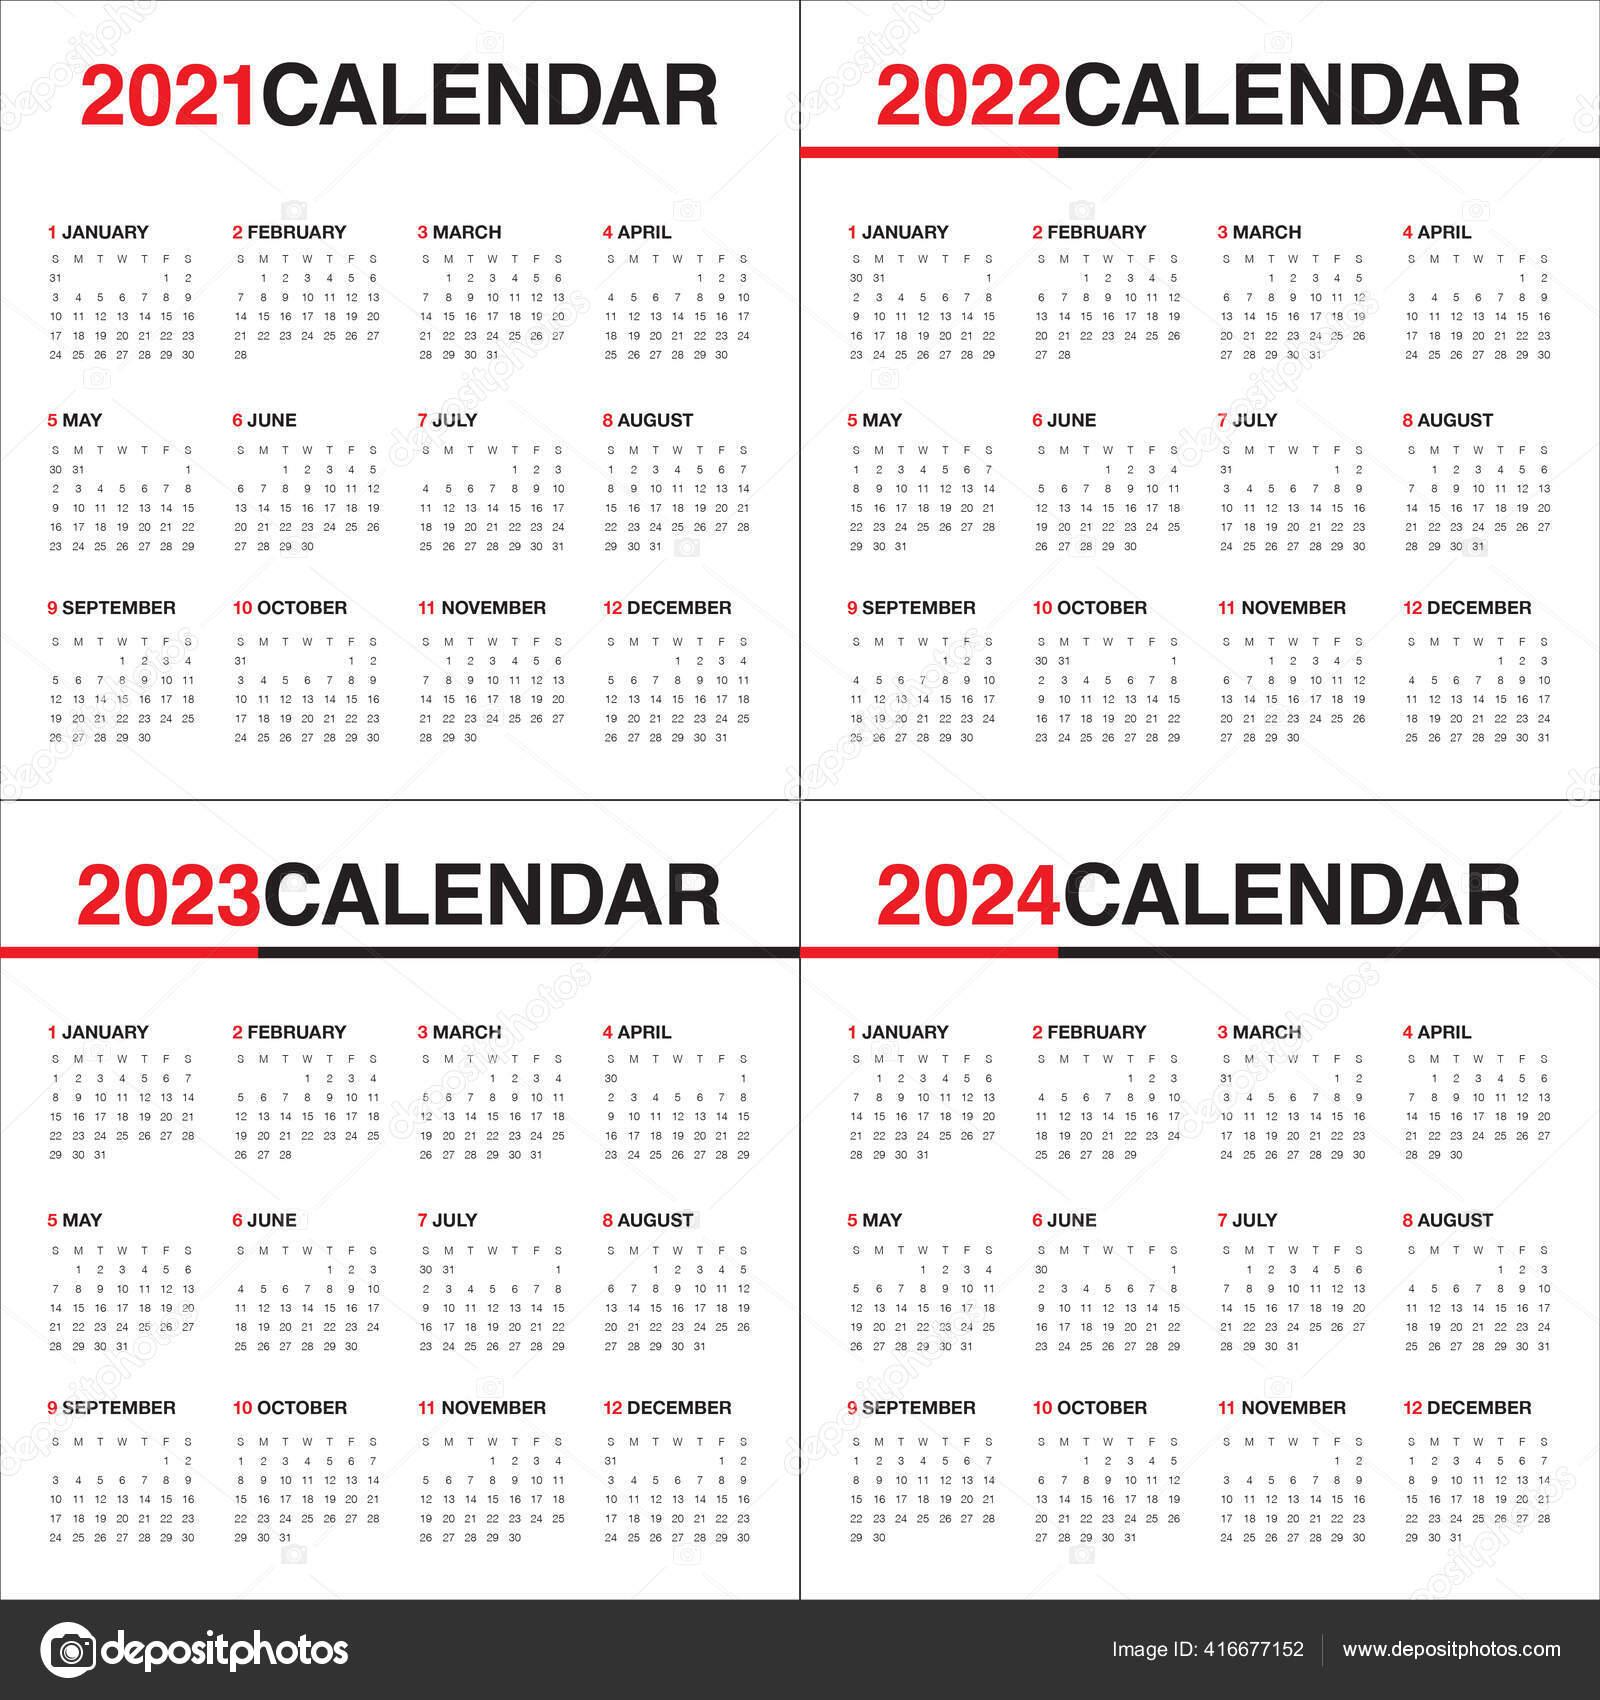 December 2023 And January 2022 Calendar.Year 2021 2022 2023 2024 Calendar Vector Design Template Simple Vector Image By C Dolphfynlow Vector Stock 416677152